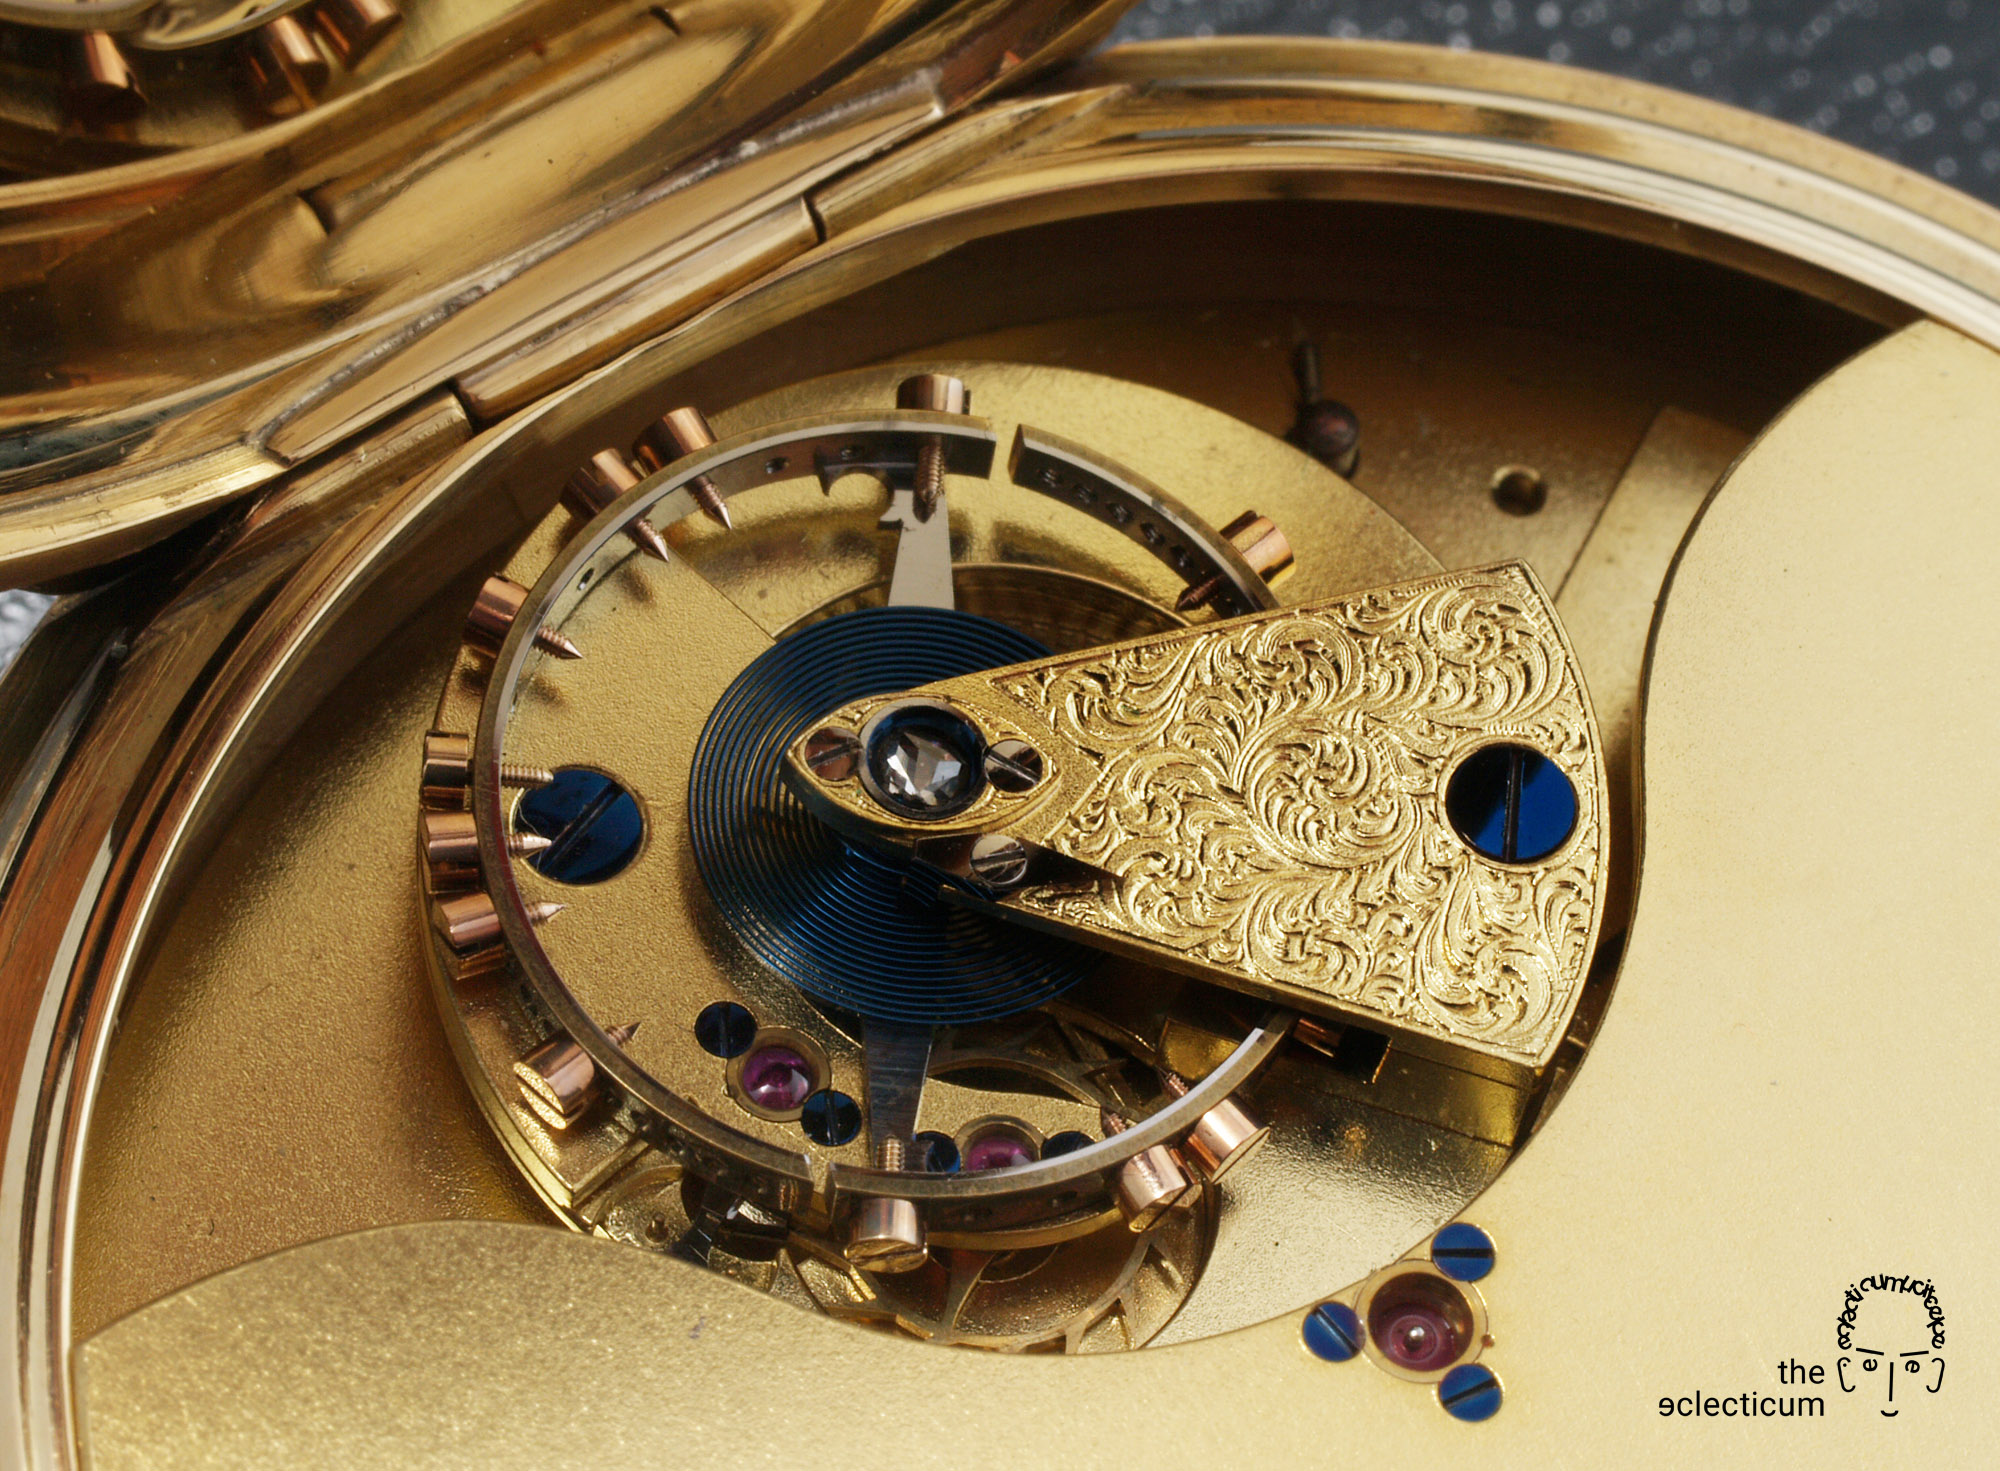 Frodsham Pocket Watch No. 08982 Bahne Bonniksen Carrousel